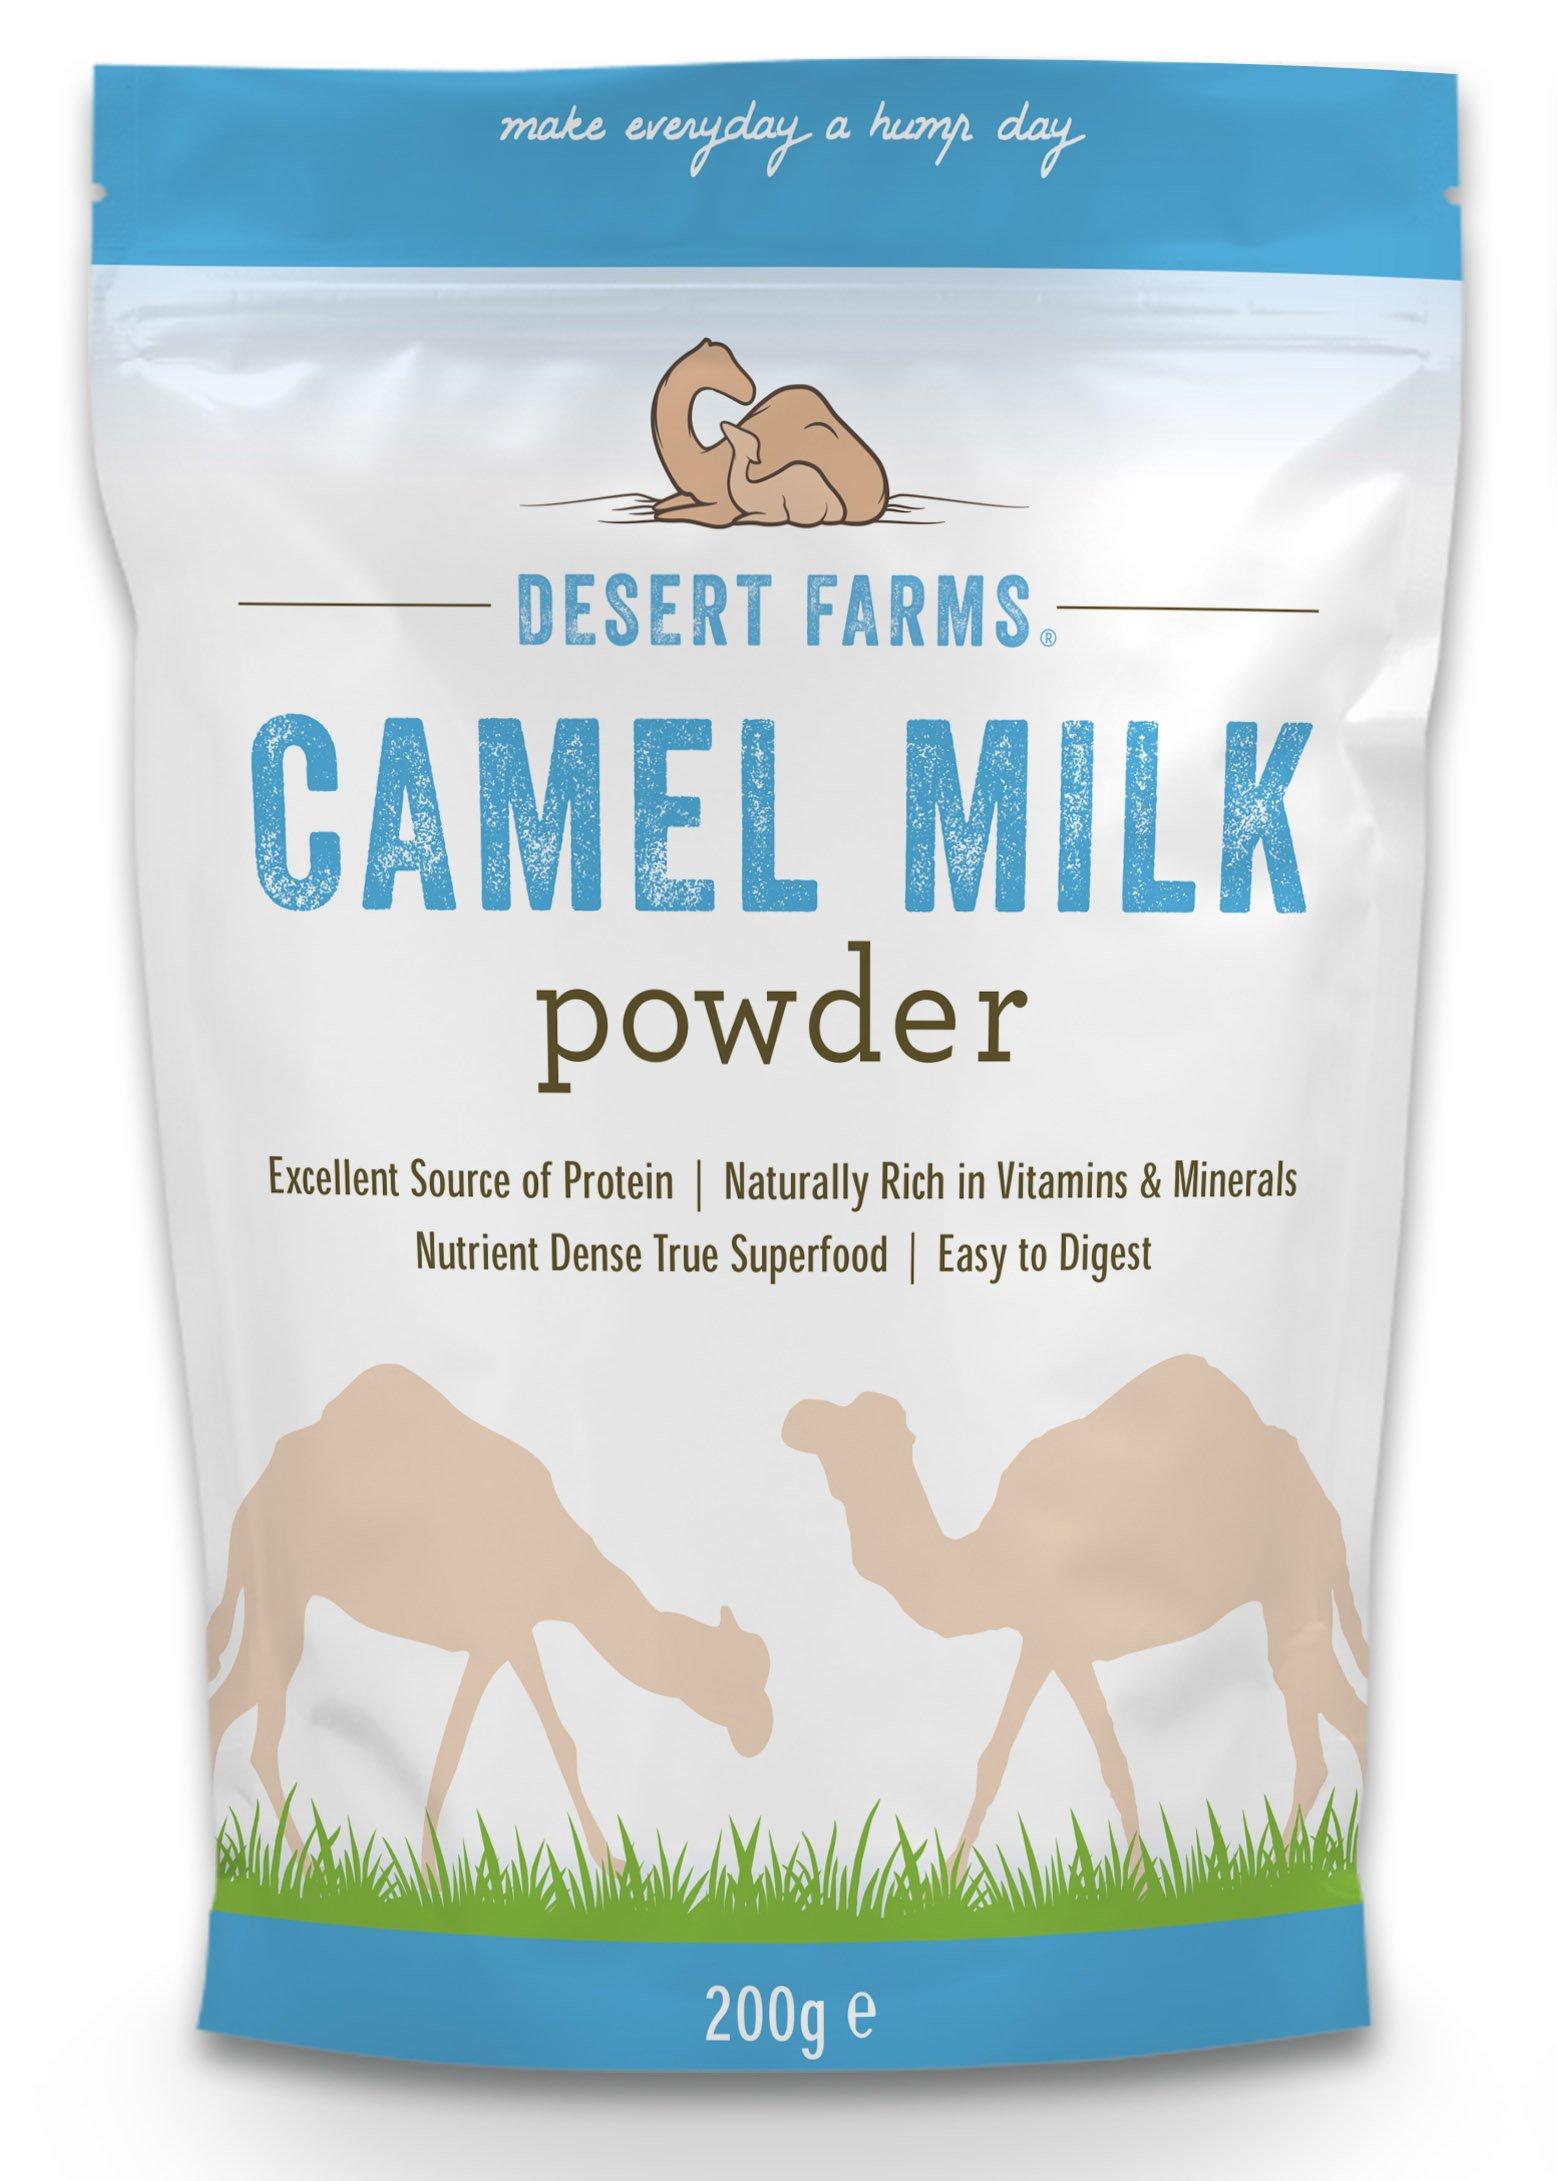 Desert Farms Camel Milk Powder, Freeze Dried by Desert Farms